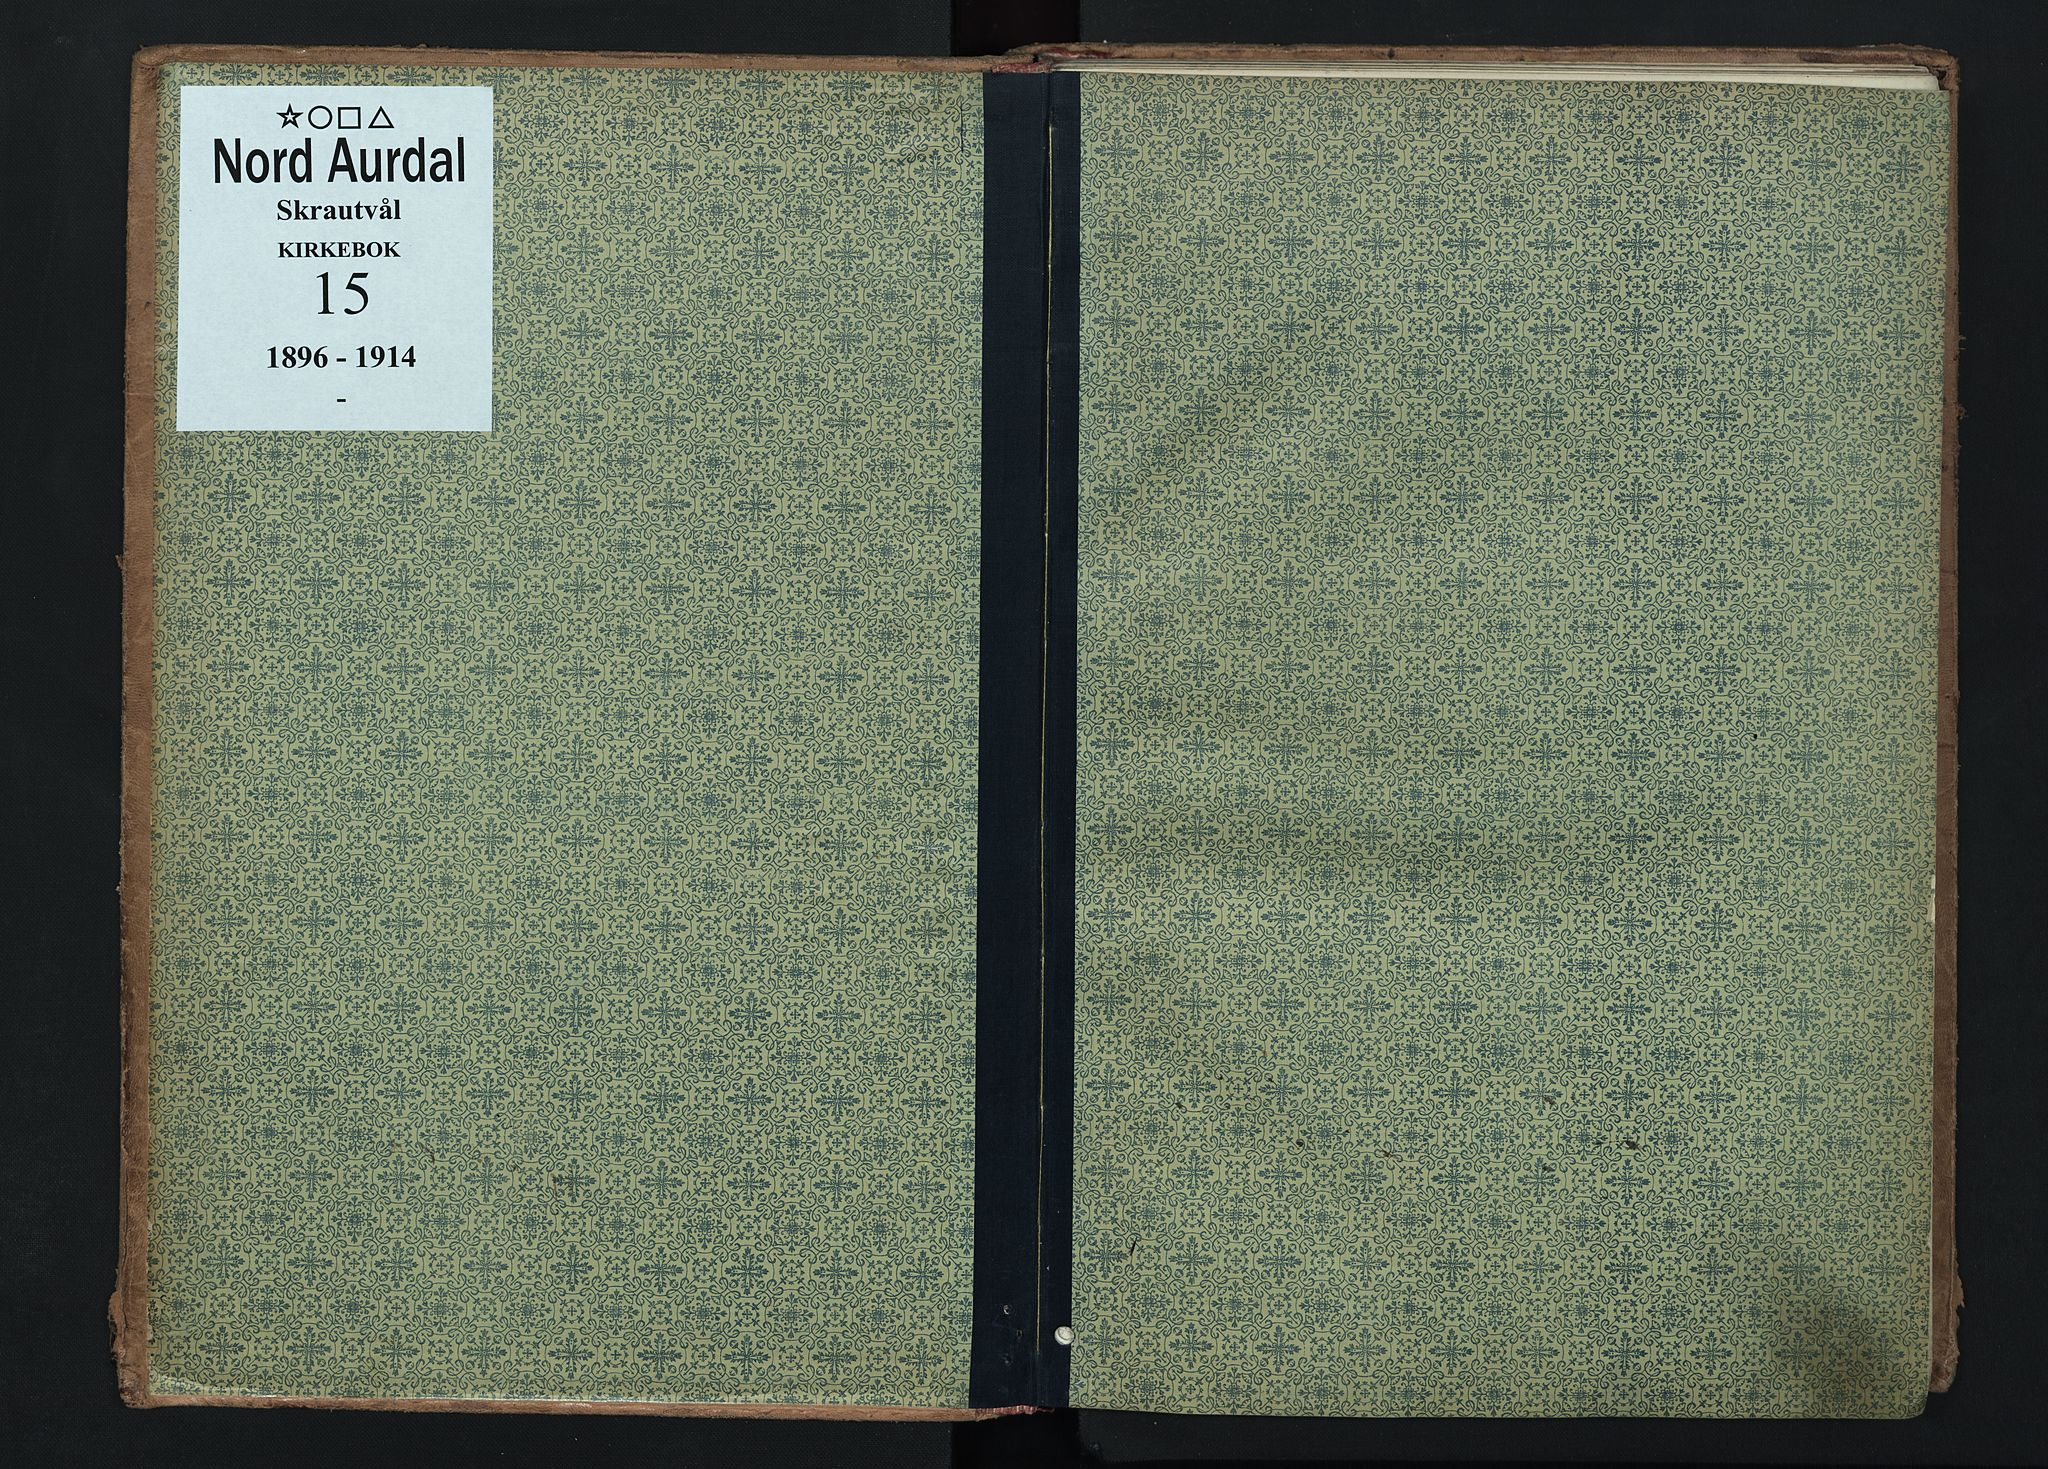 SAH, Nord-Aurdal prestekontor, Ministerialbok nr. 15, 1896-1914